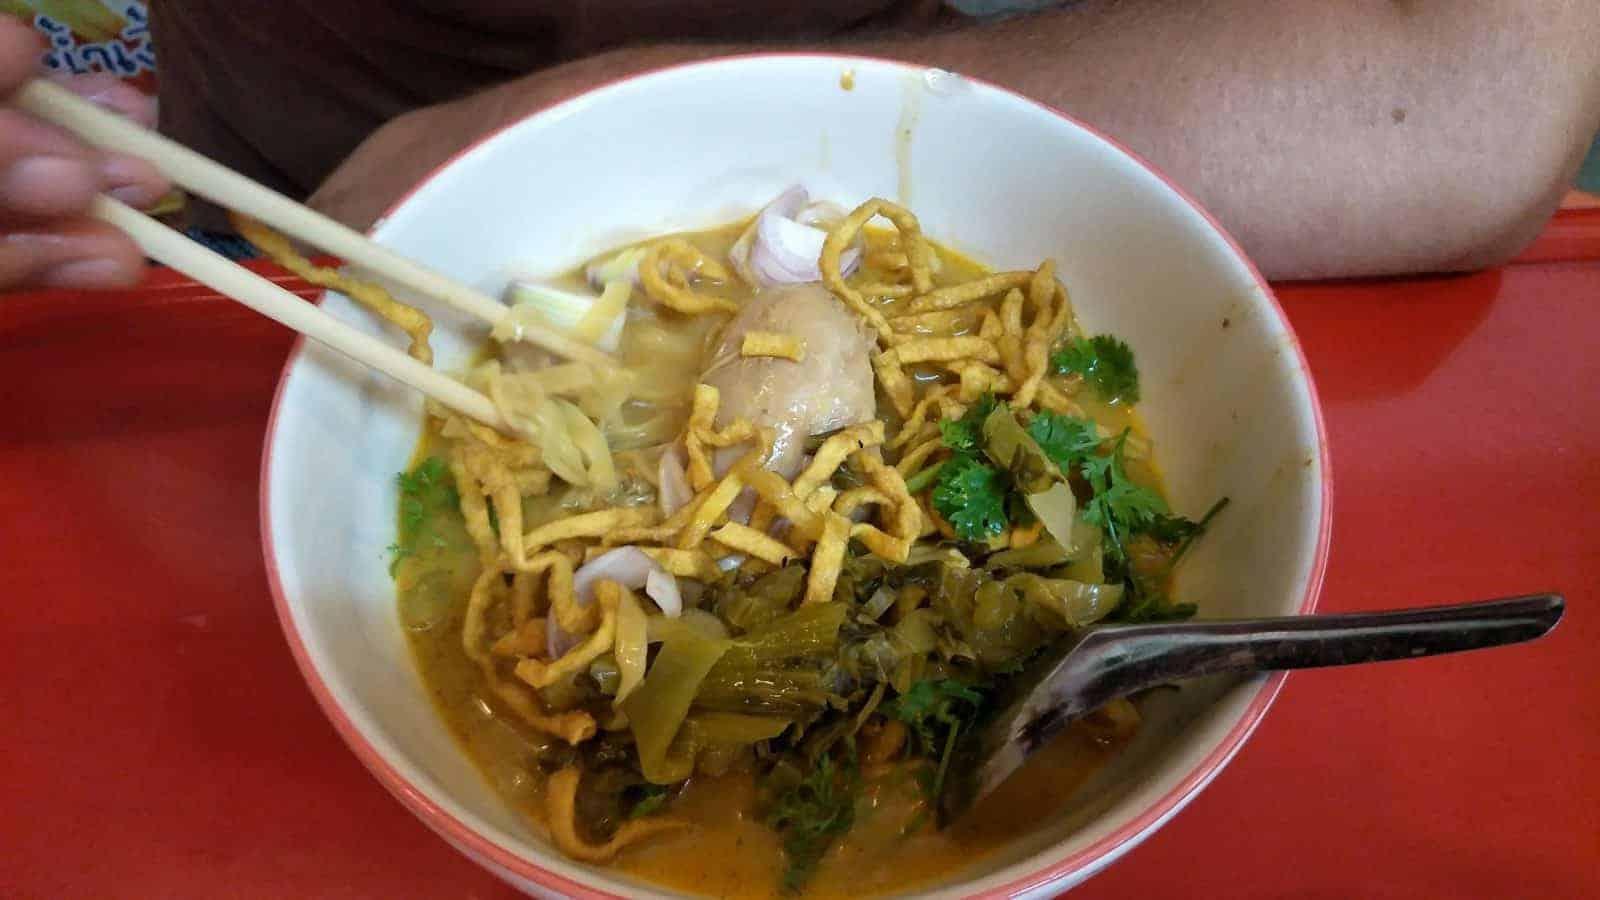 Khao Soi: Chiang Mai's most famous dish - 30 THB